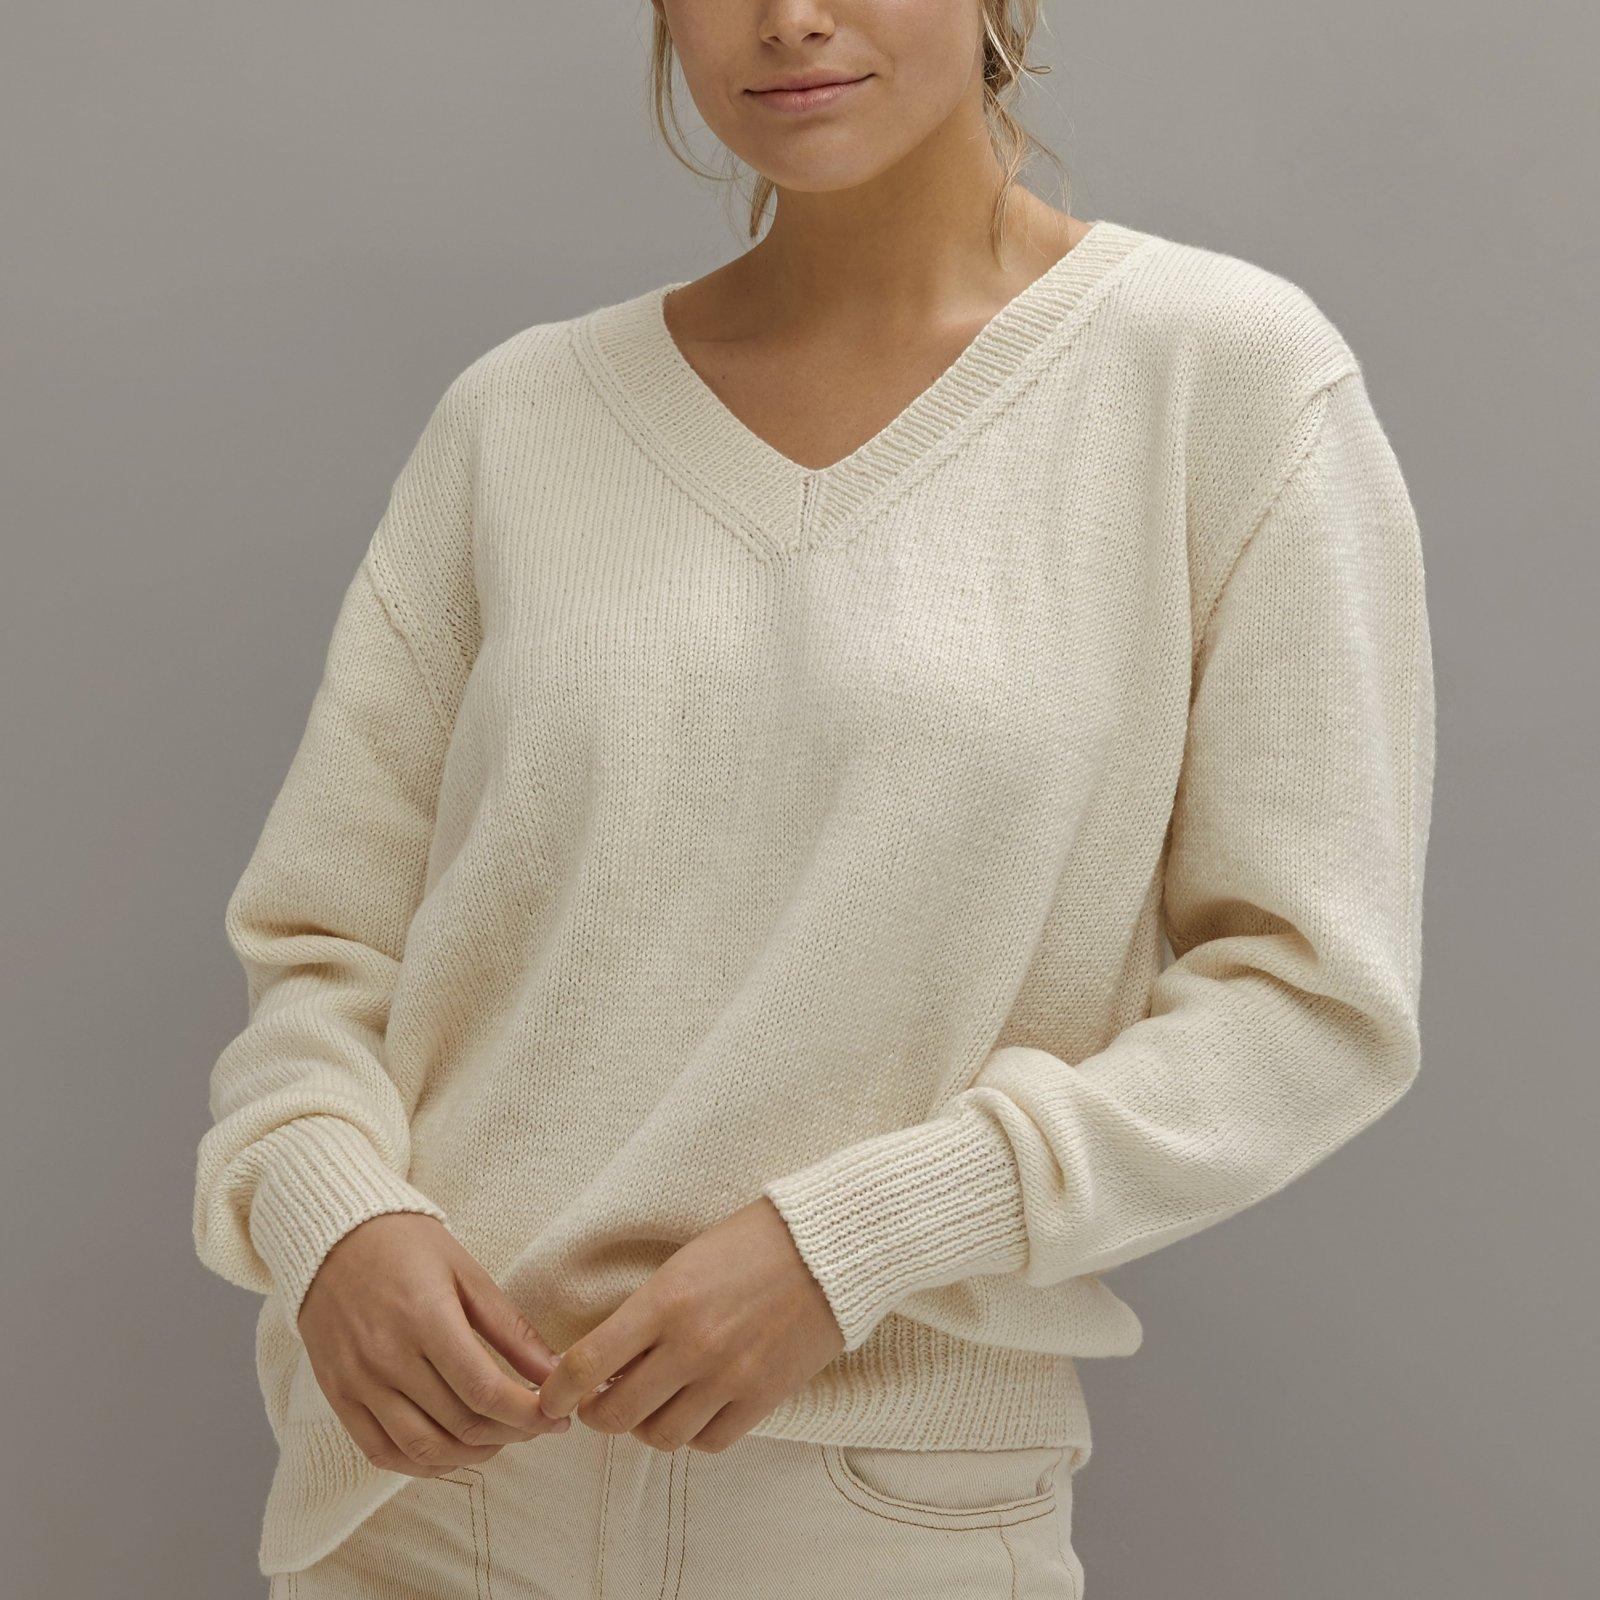 Bellissimo - MERCEDES 793 - Sweater Pattern